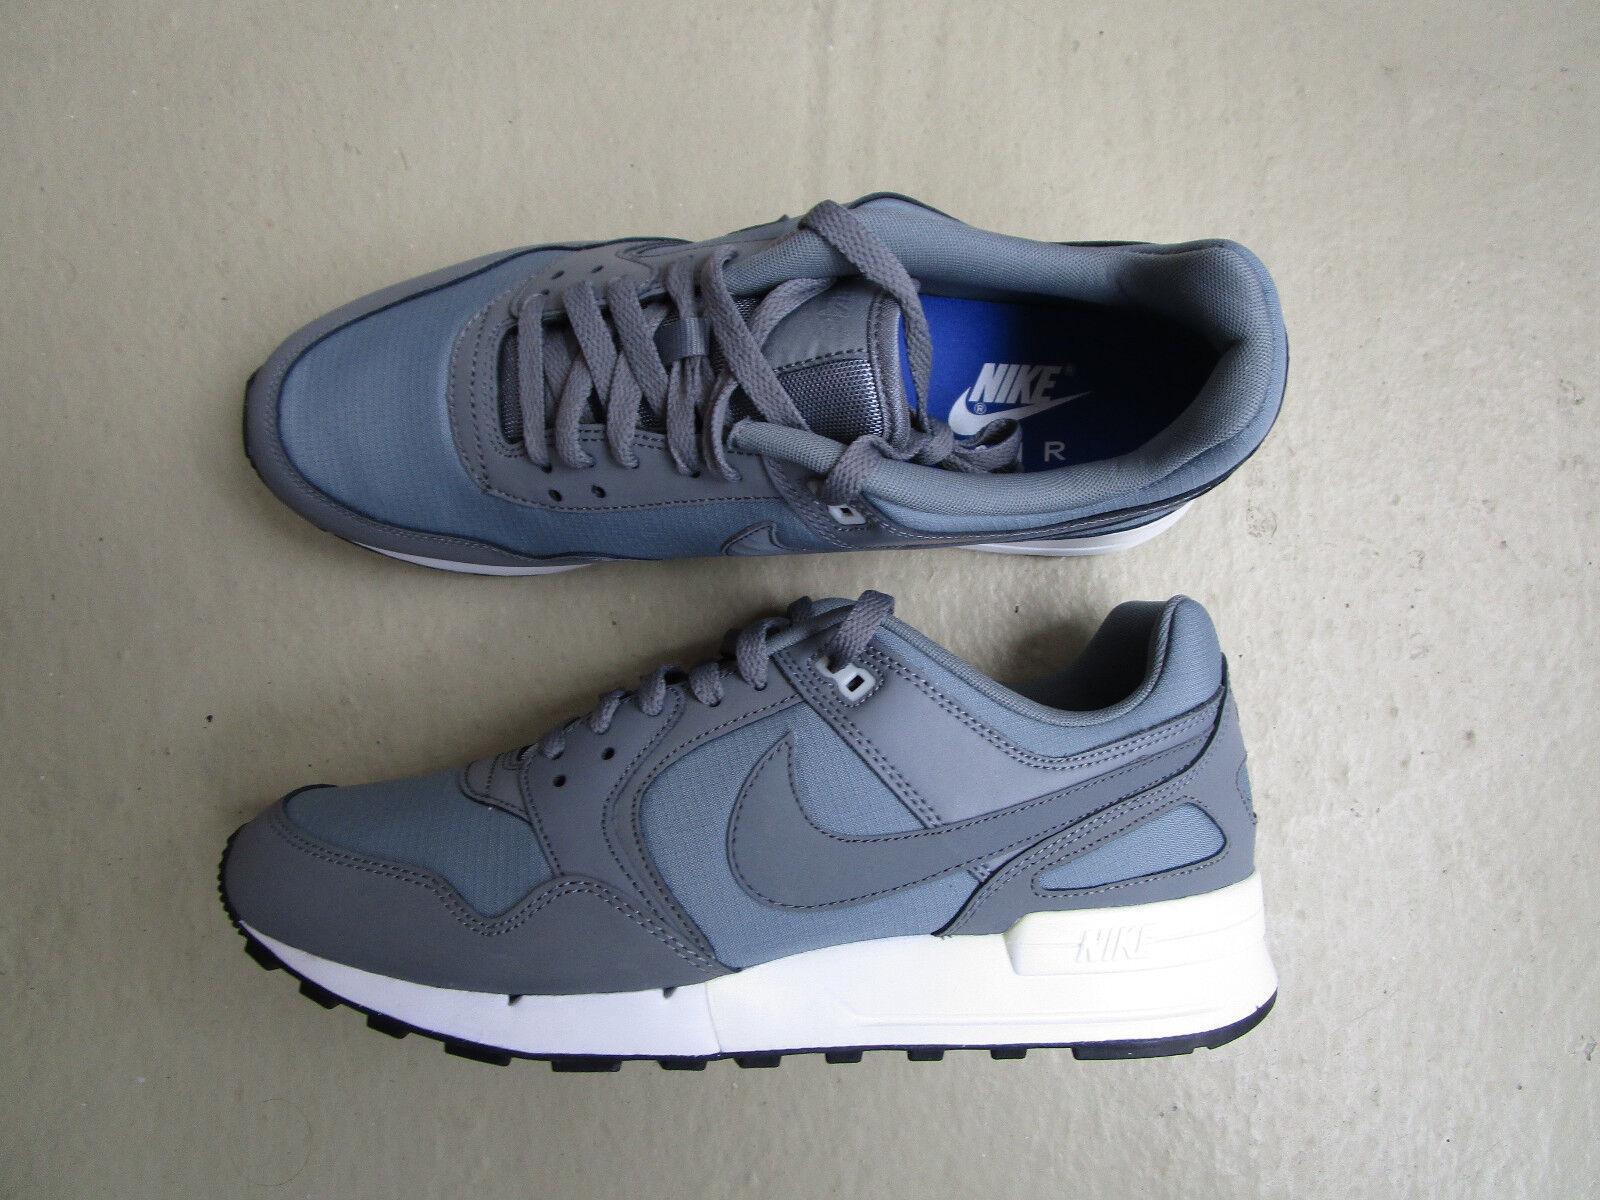 Nike Air Pegasus 89 45 Cool Grey Comet bluee White